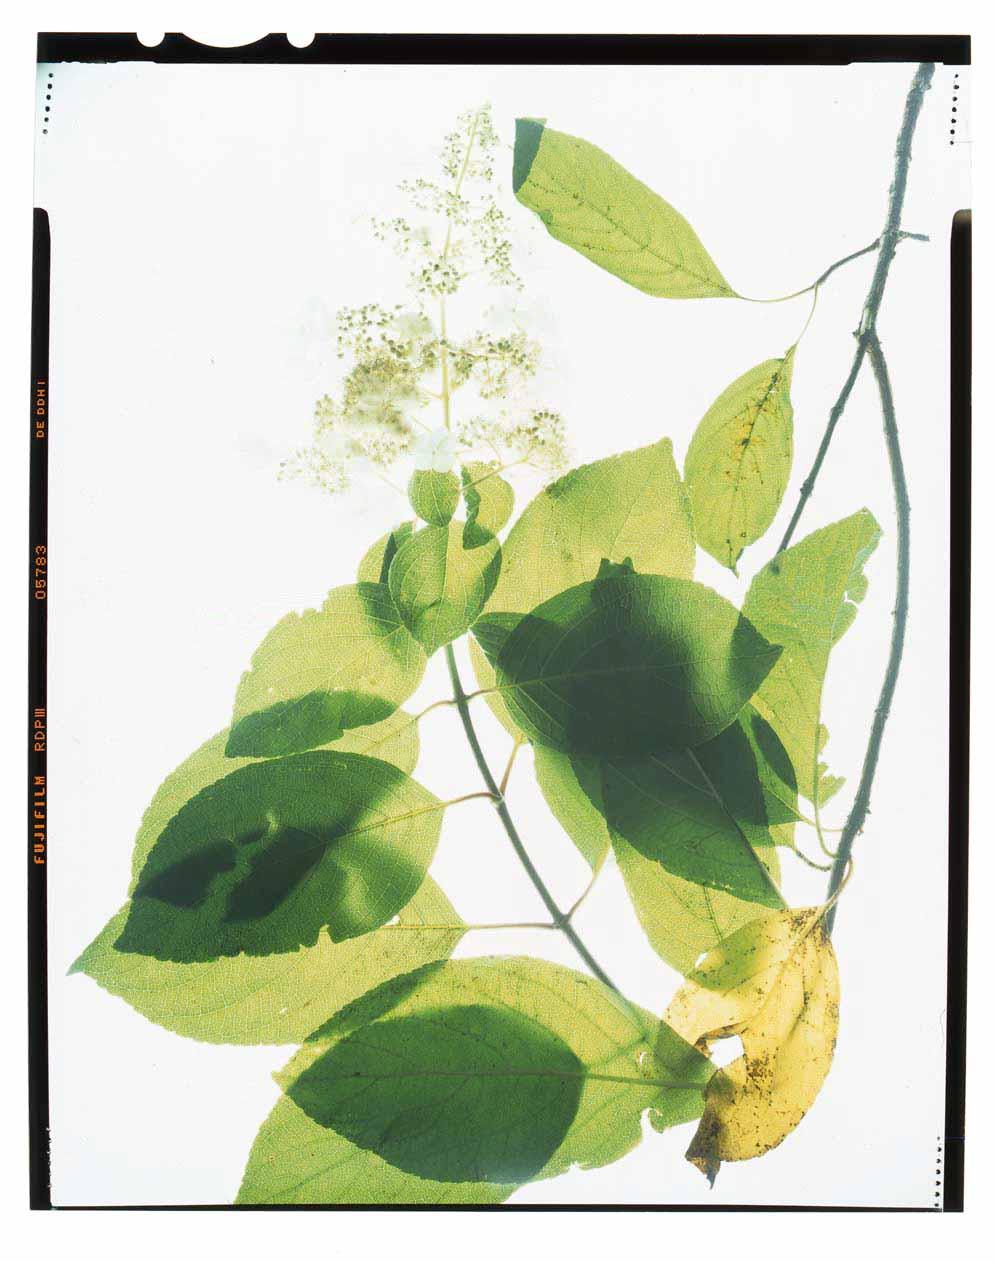 Hydrangea paniculata Grandiflora Honour Hiers Stewart 2013.jpg